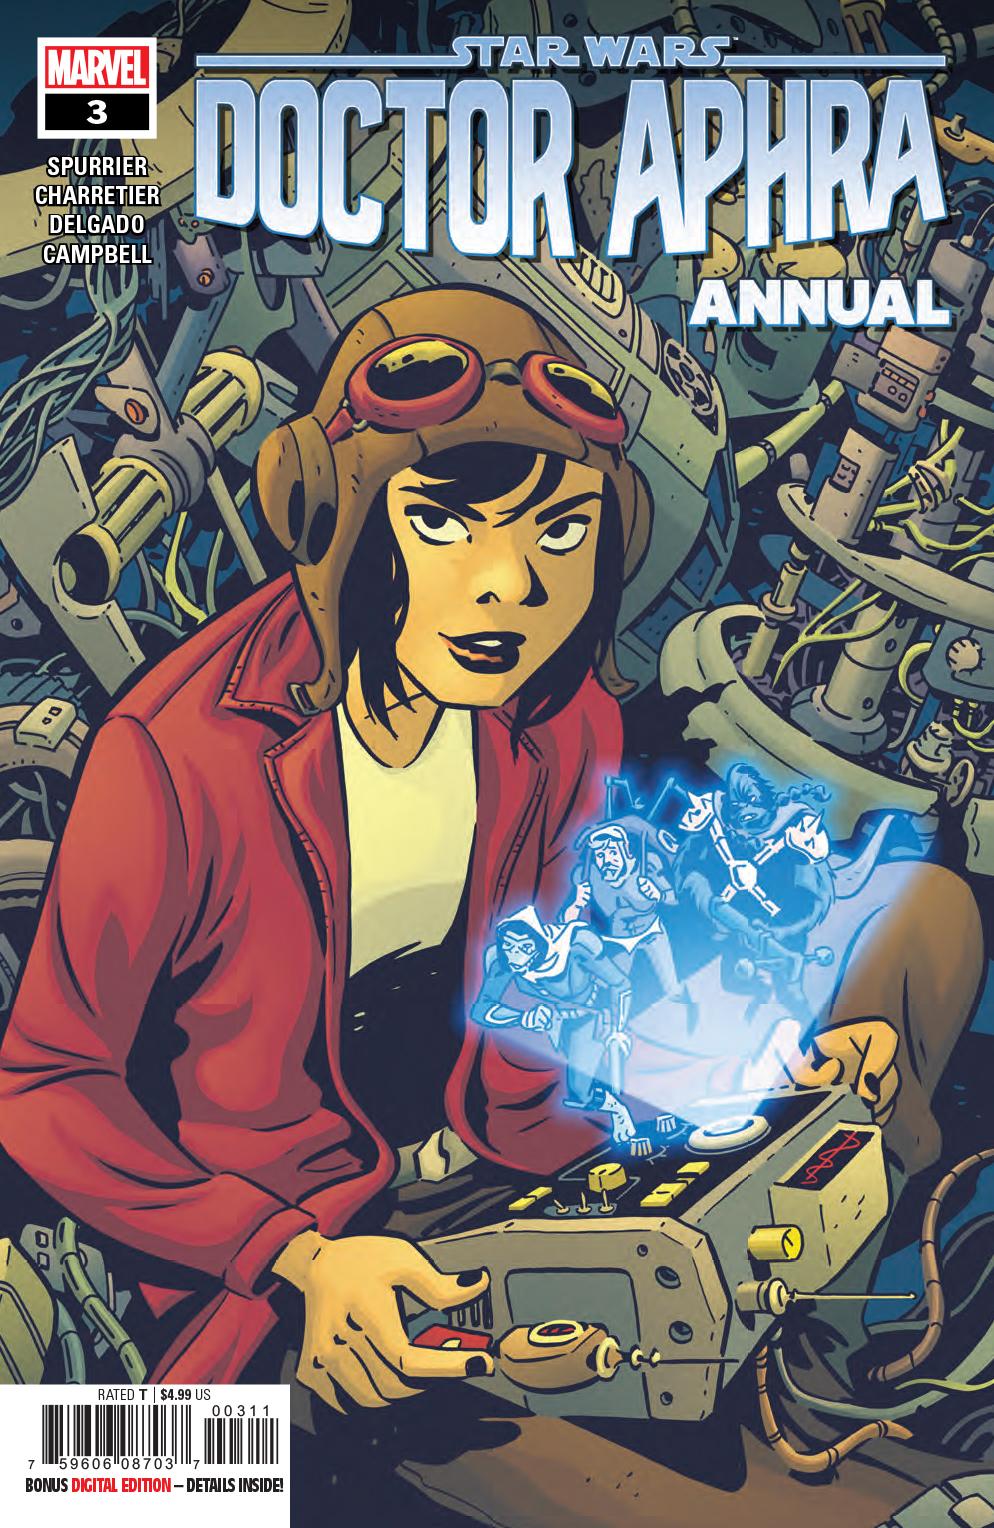 Marvel Comics Star Wars DOCTOR APHRA #37 first printing